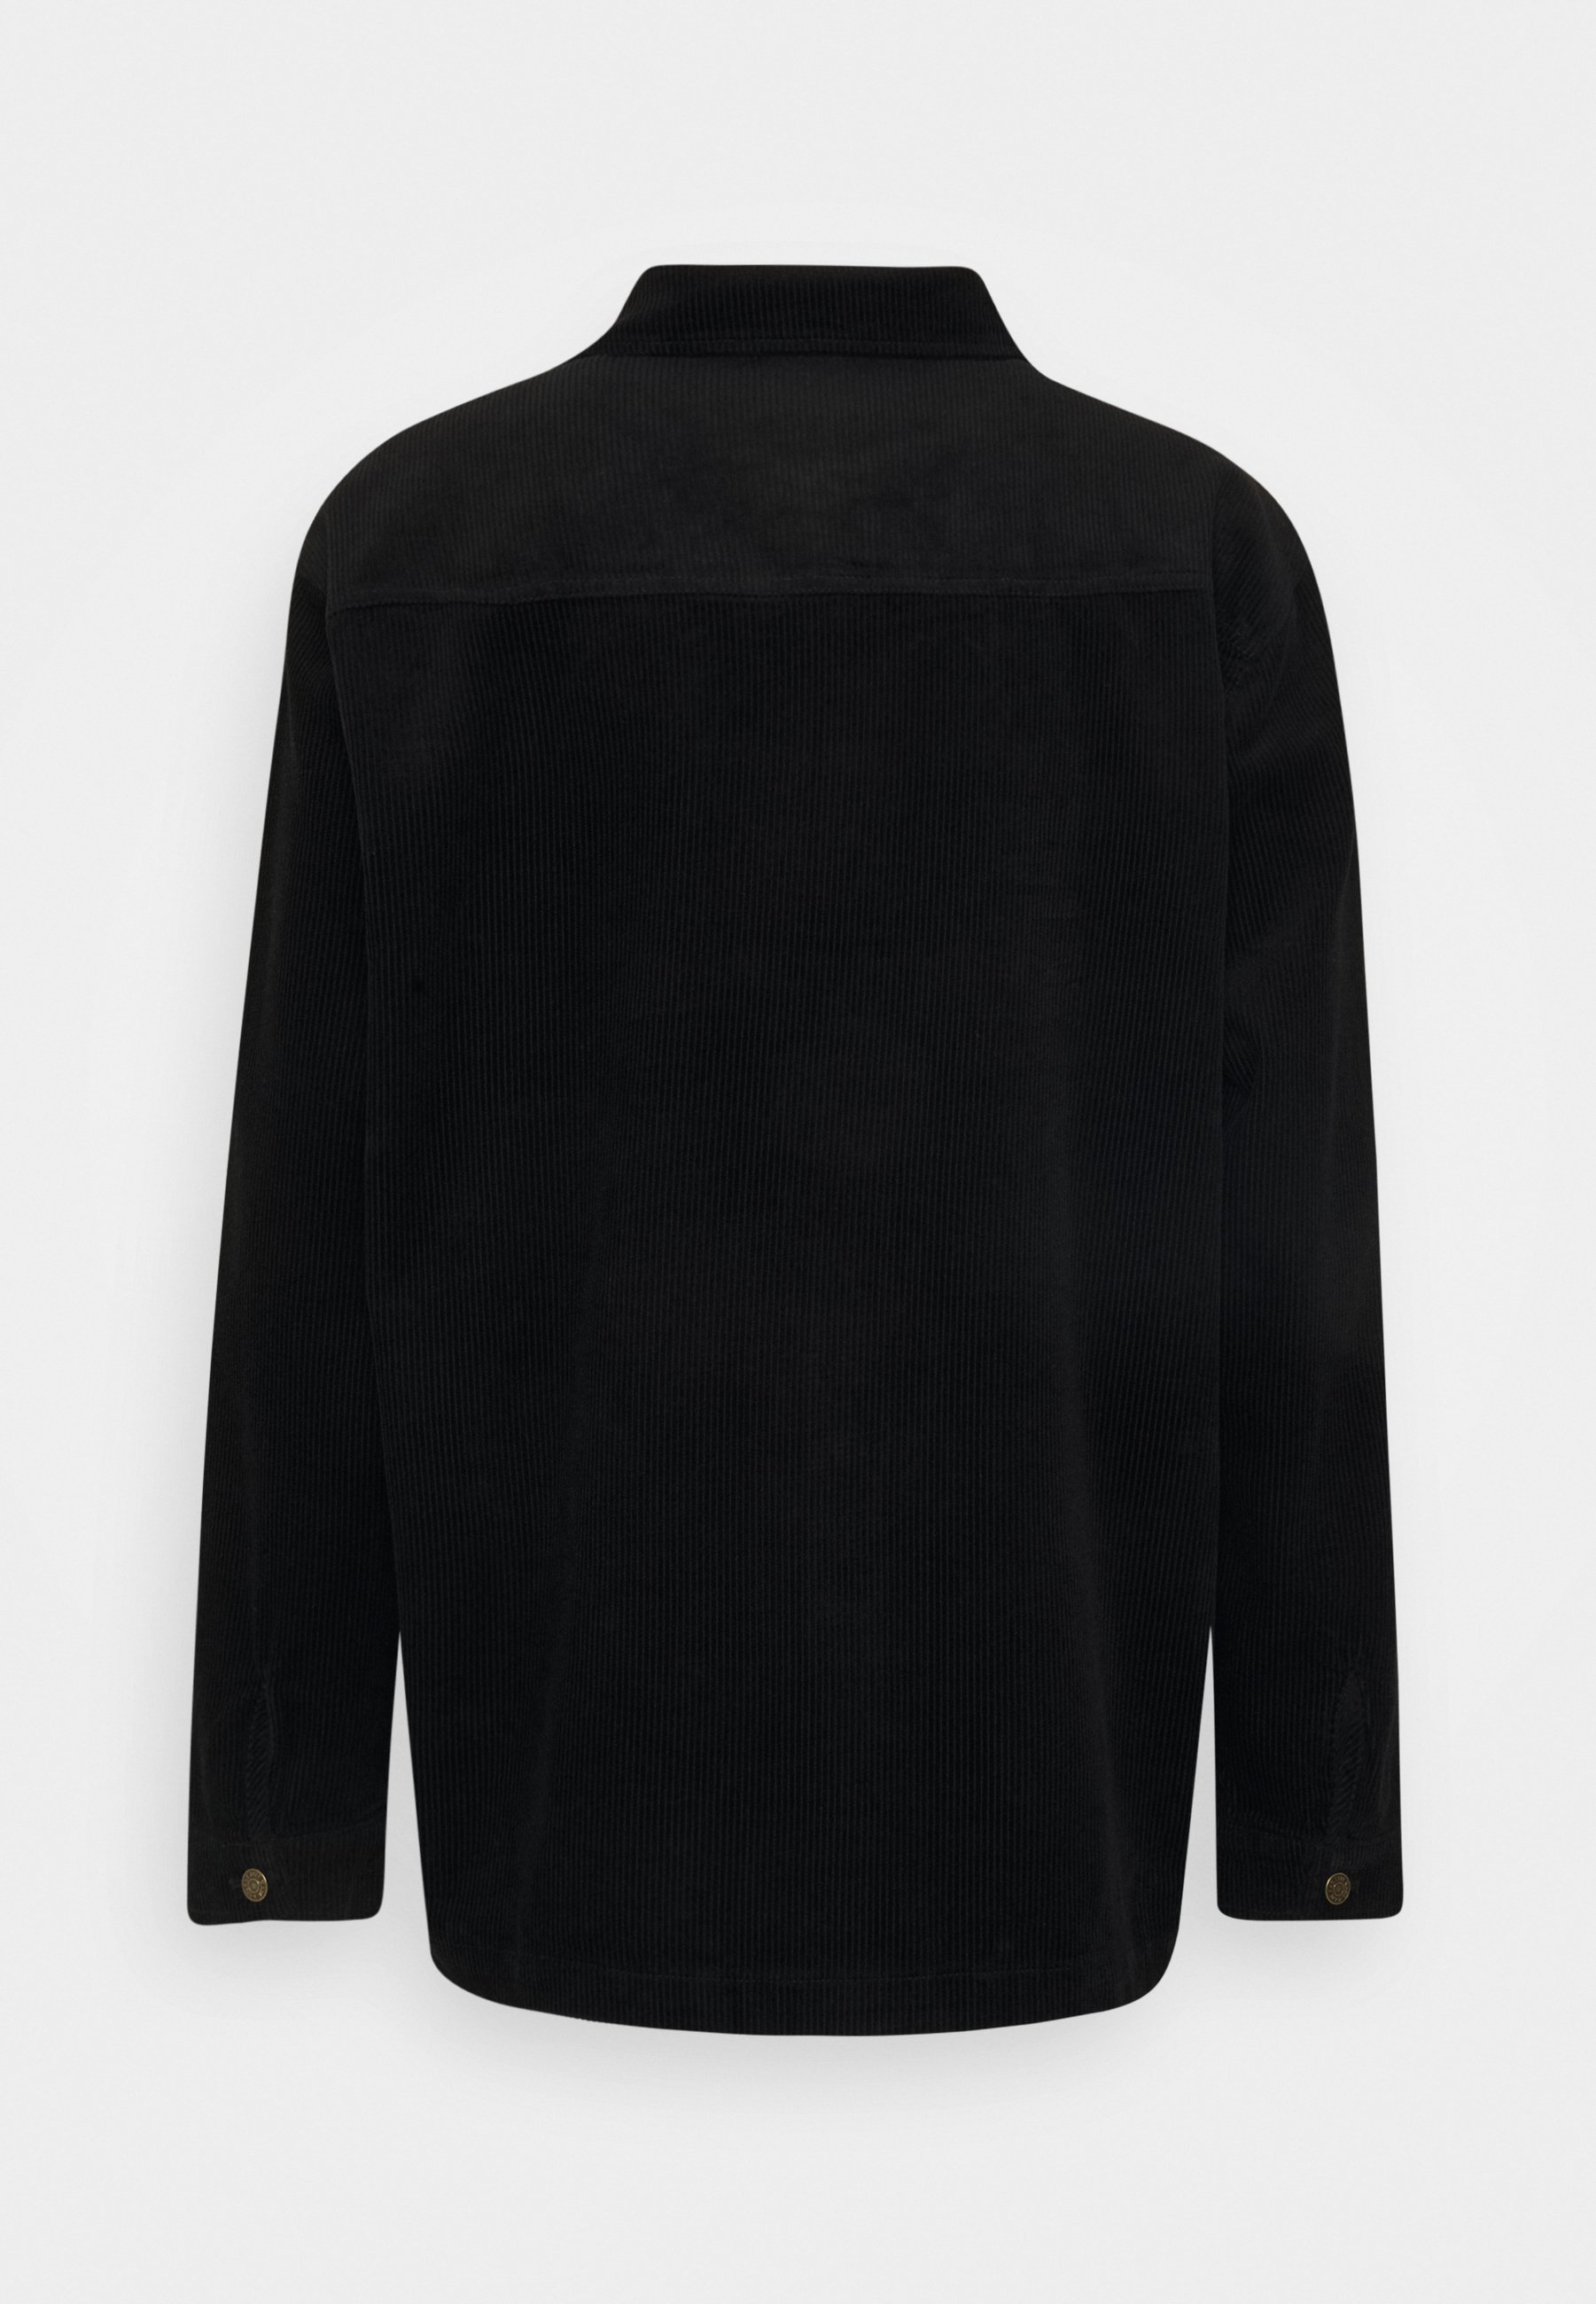 Karl Kani SIGNATURE JACKET Skjorte black Zalando.no